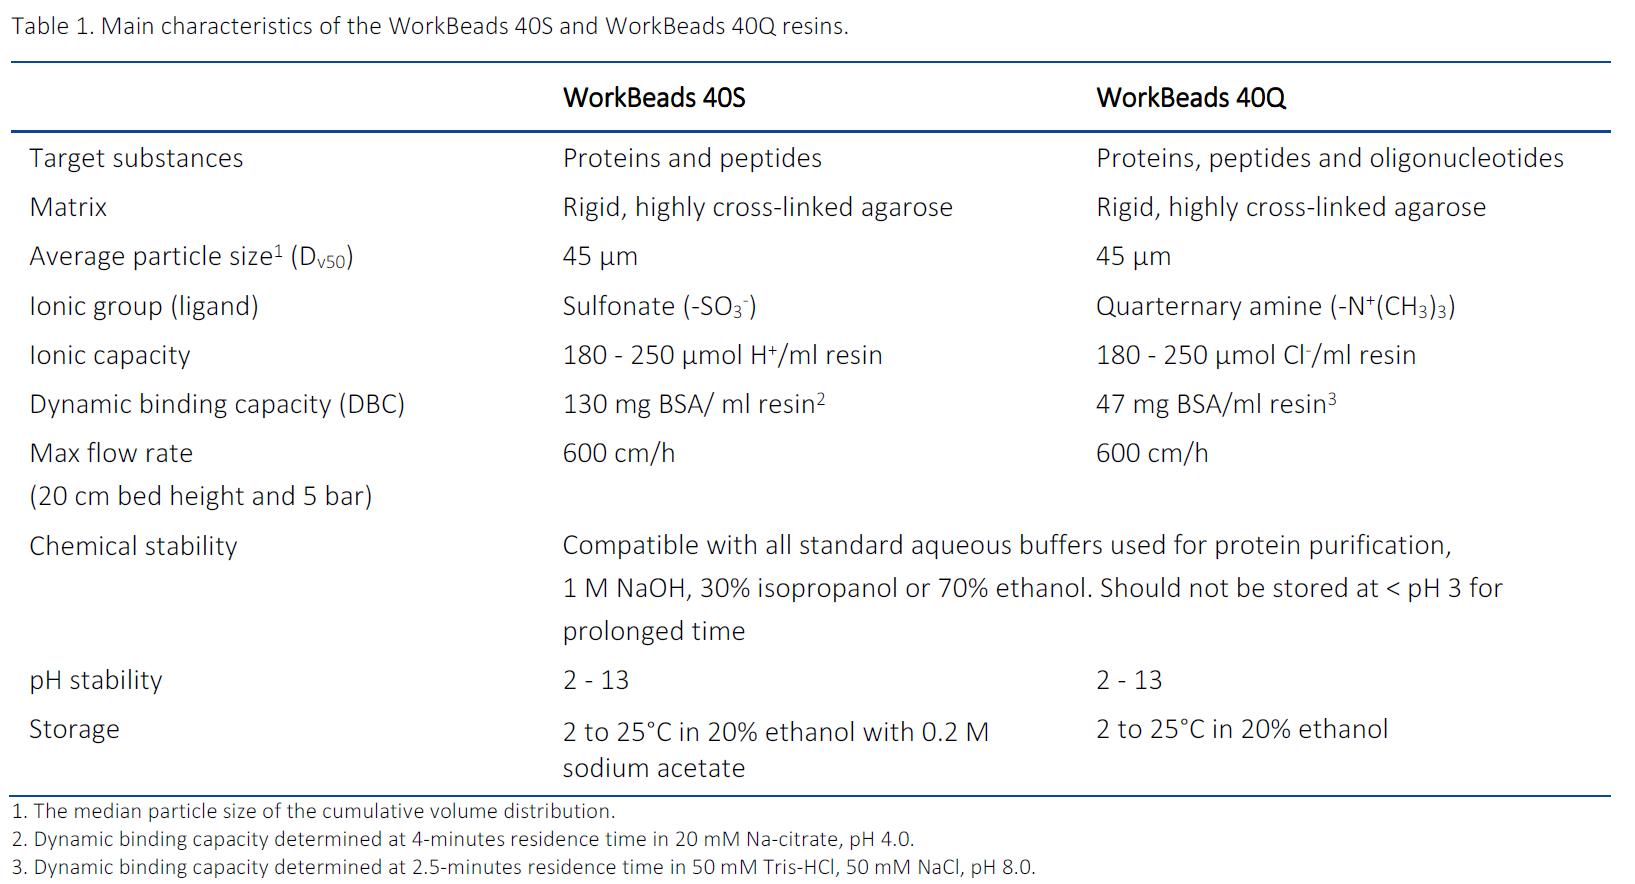 WorkBeads 40Q